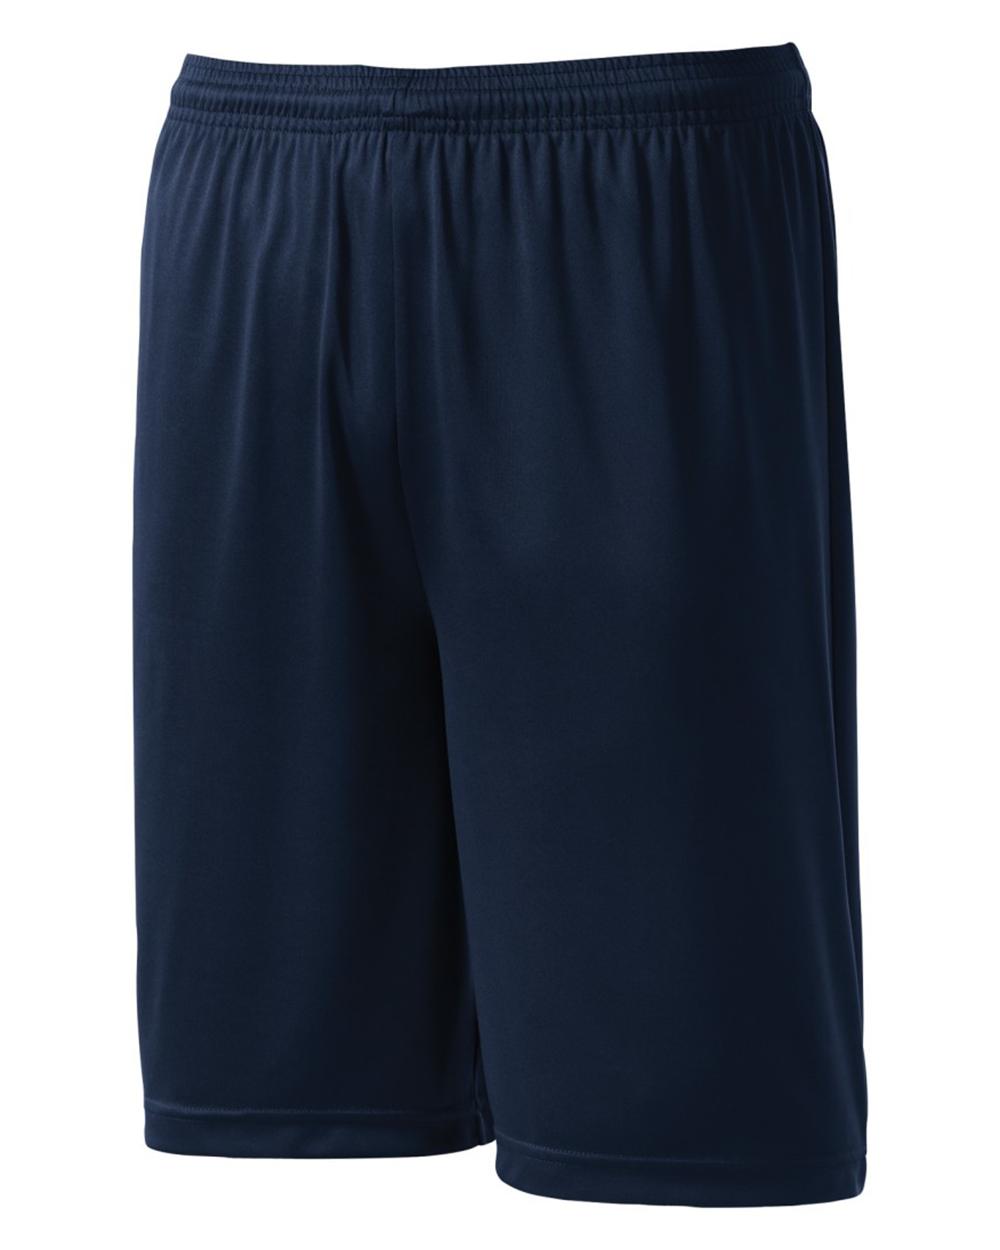 Pro Team Shorts